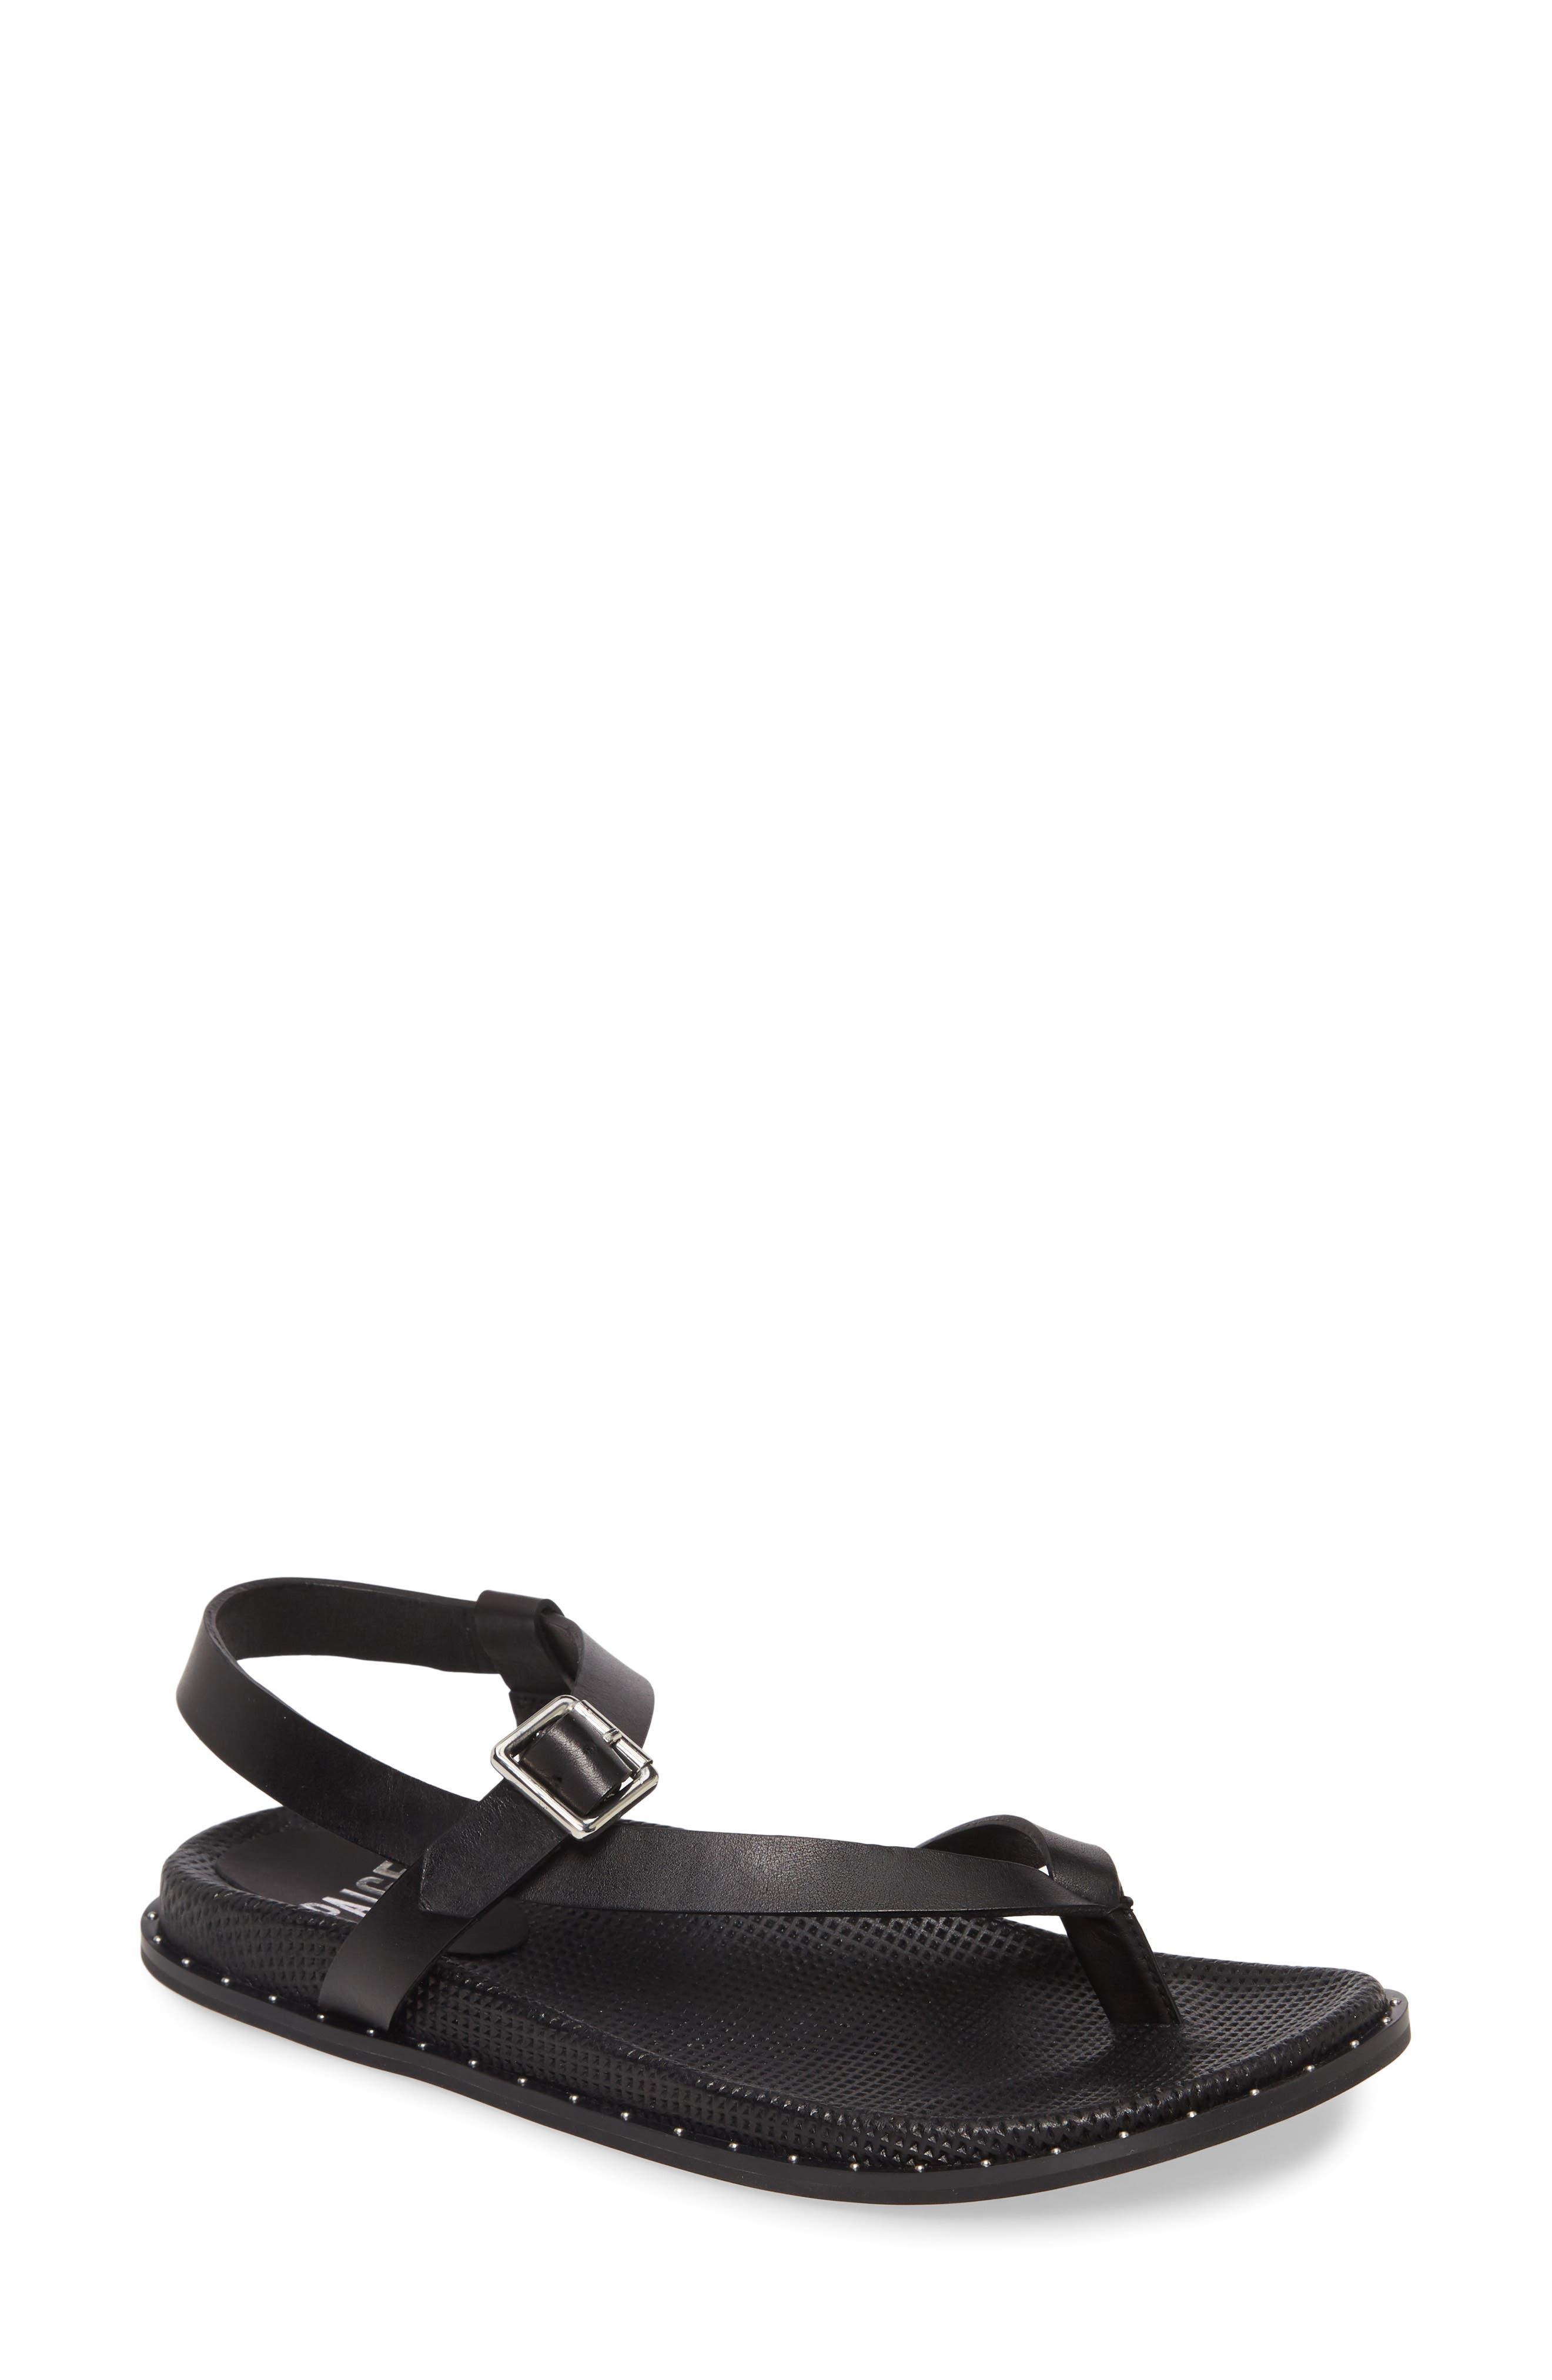 Image of PAIGE Zuri Sport Sandal